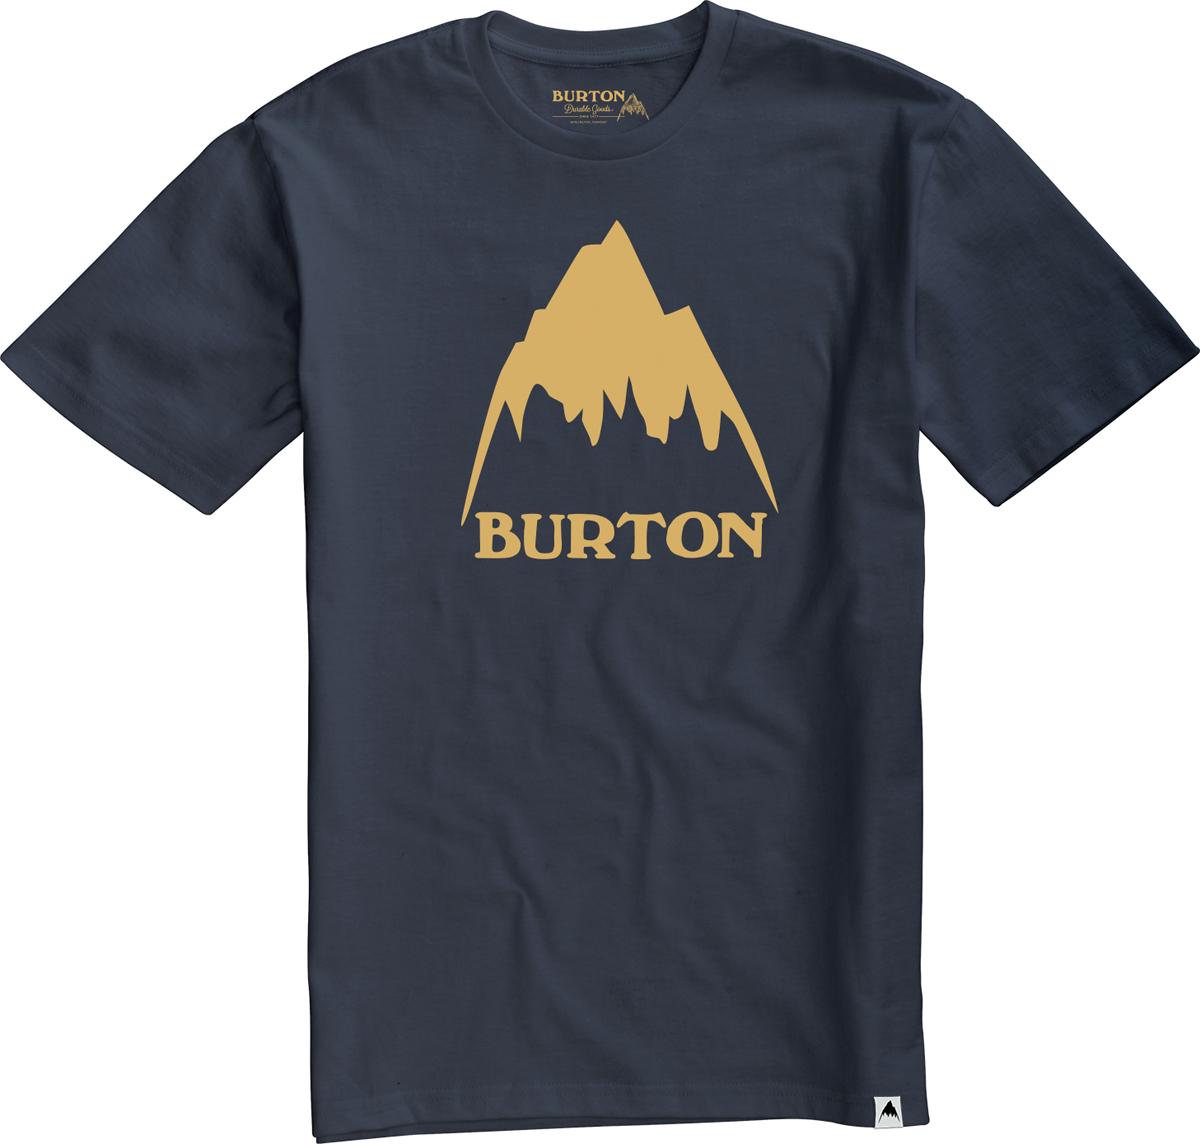 Футболка мужская Burton Mb Clssmtnhgh Ss, цвет: темно-синий. 13882105400. Размер XXL (54) футболка мужская anta цвет синий 85835146 2 размер xxl 54